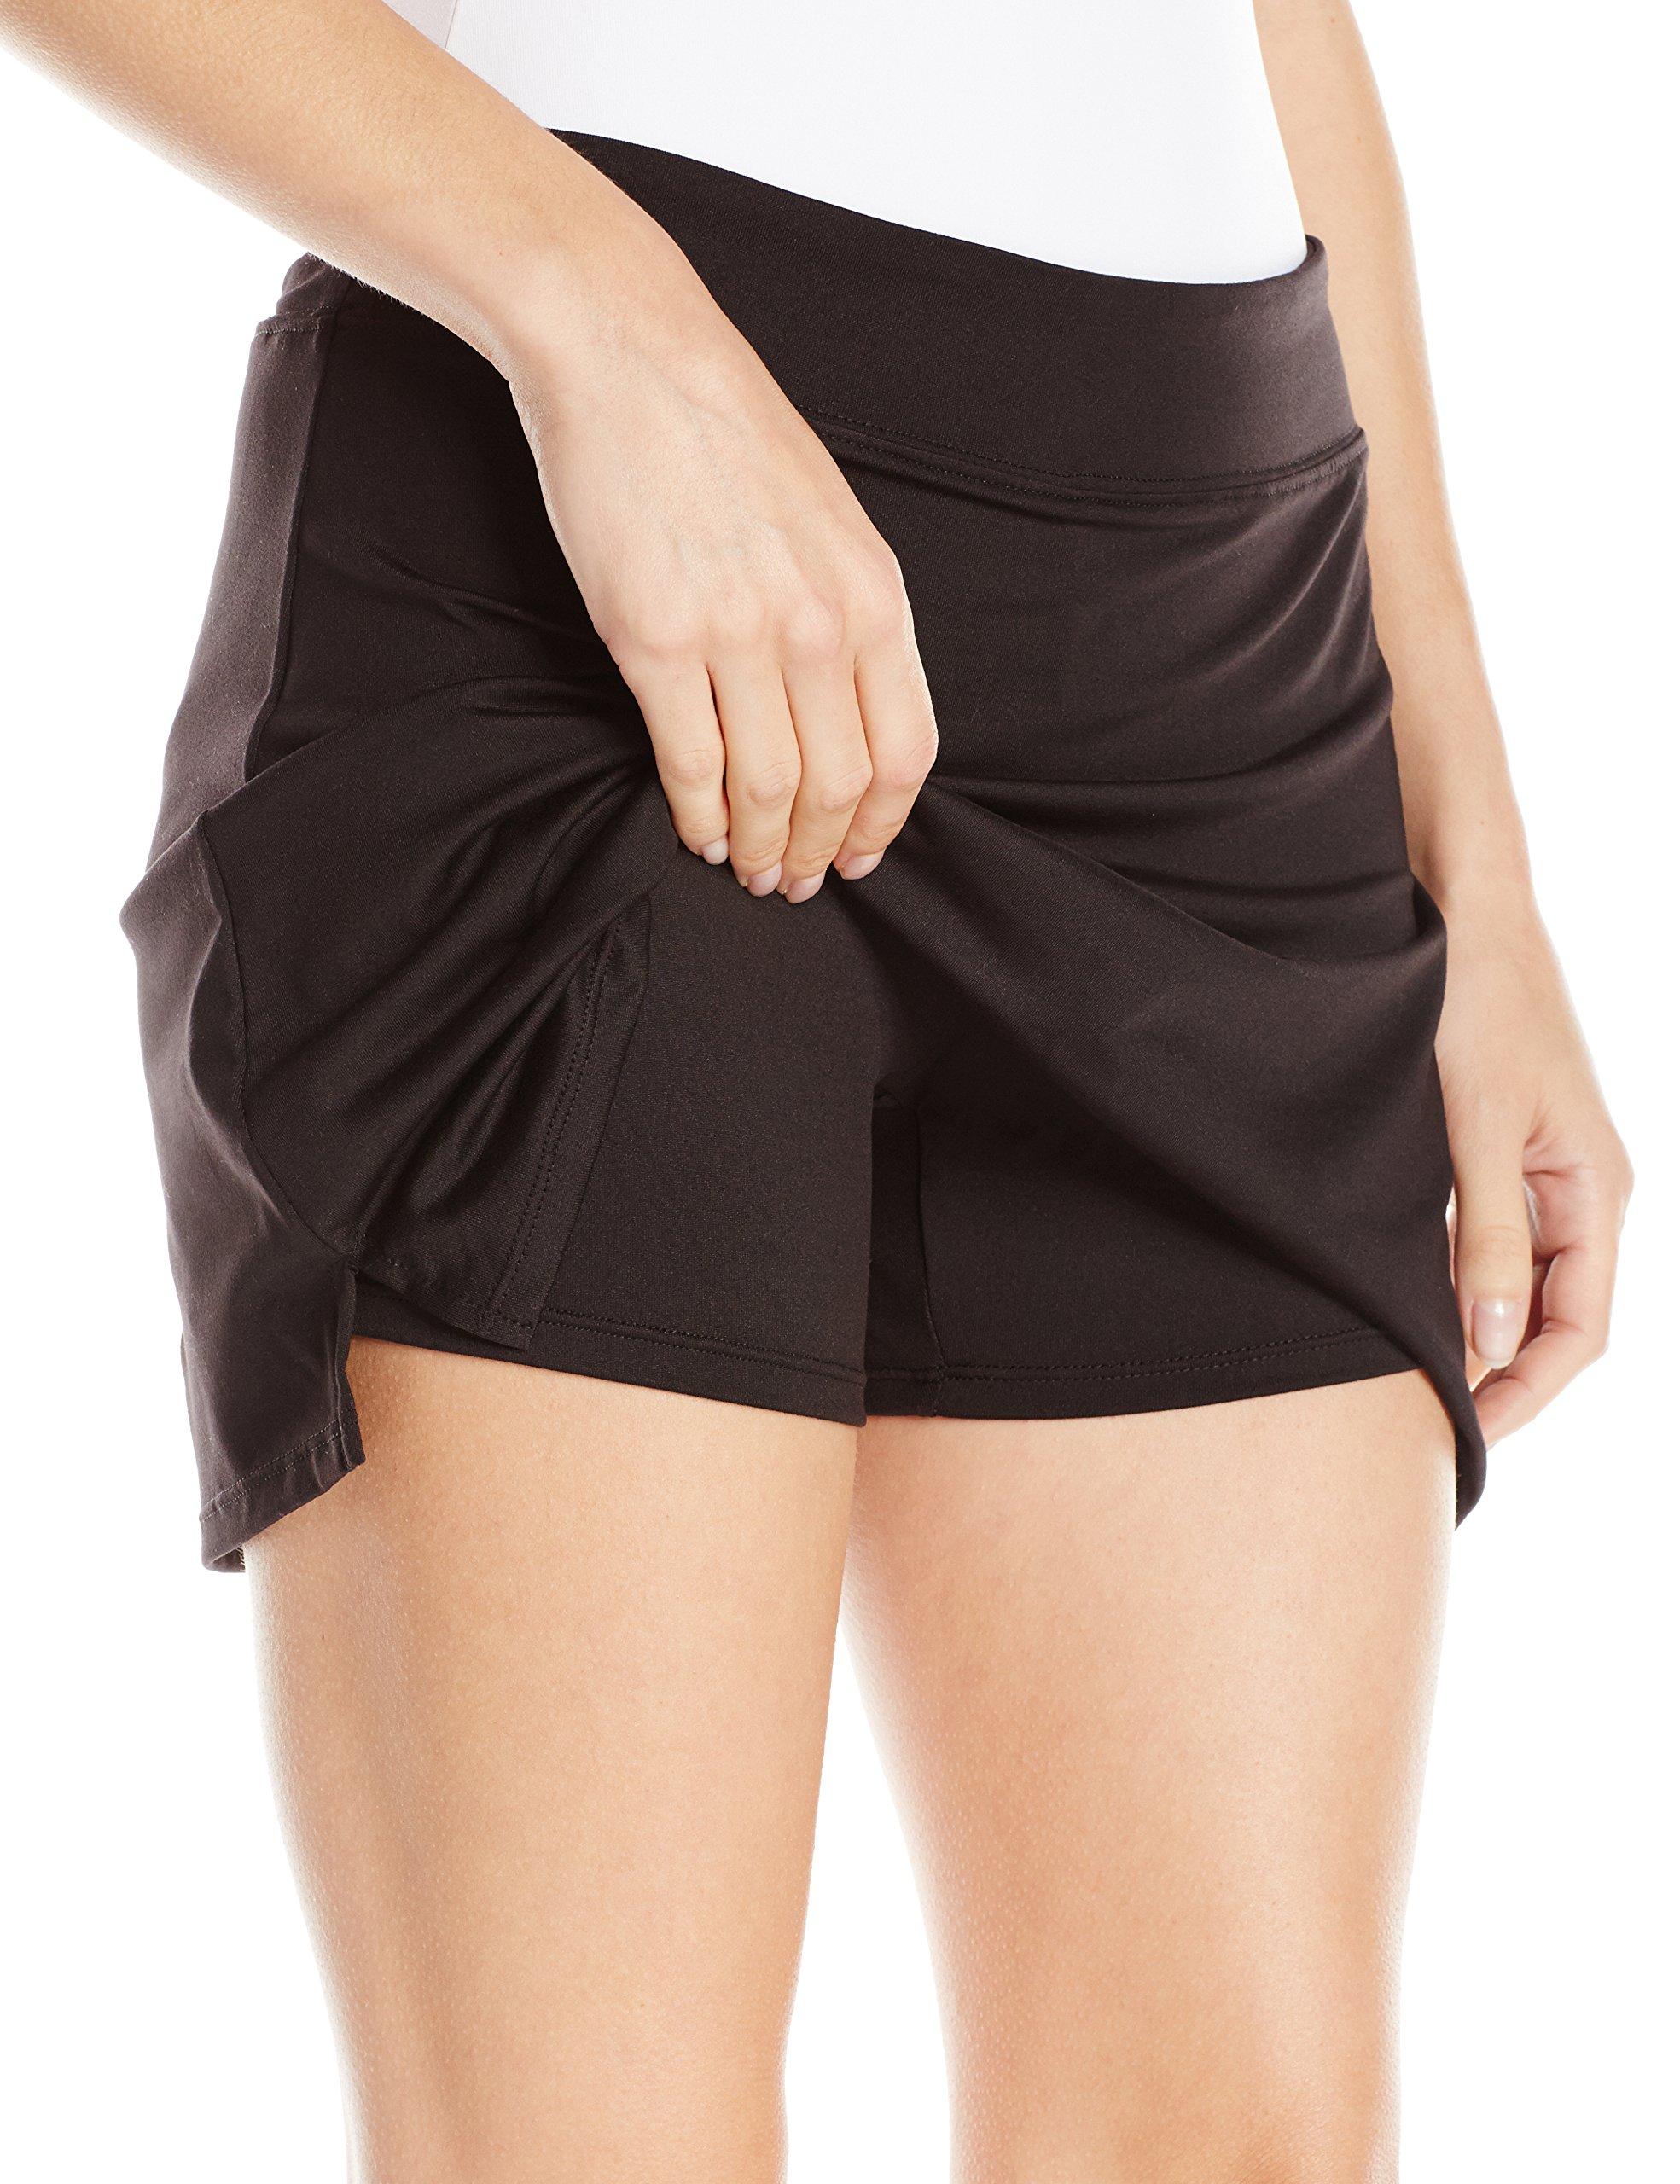 Colorado Clothing Women's Tranquility Skort, Black, Large